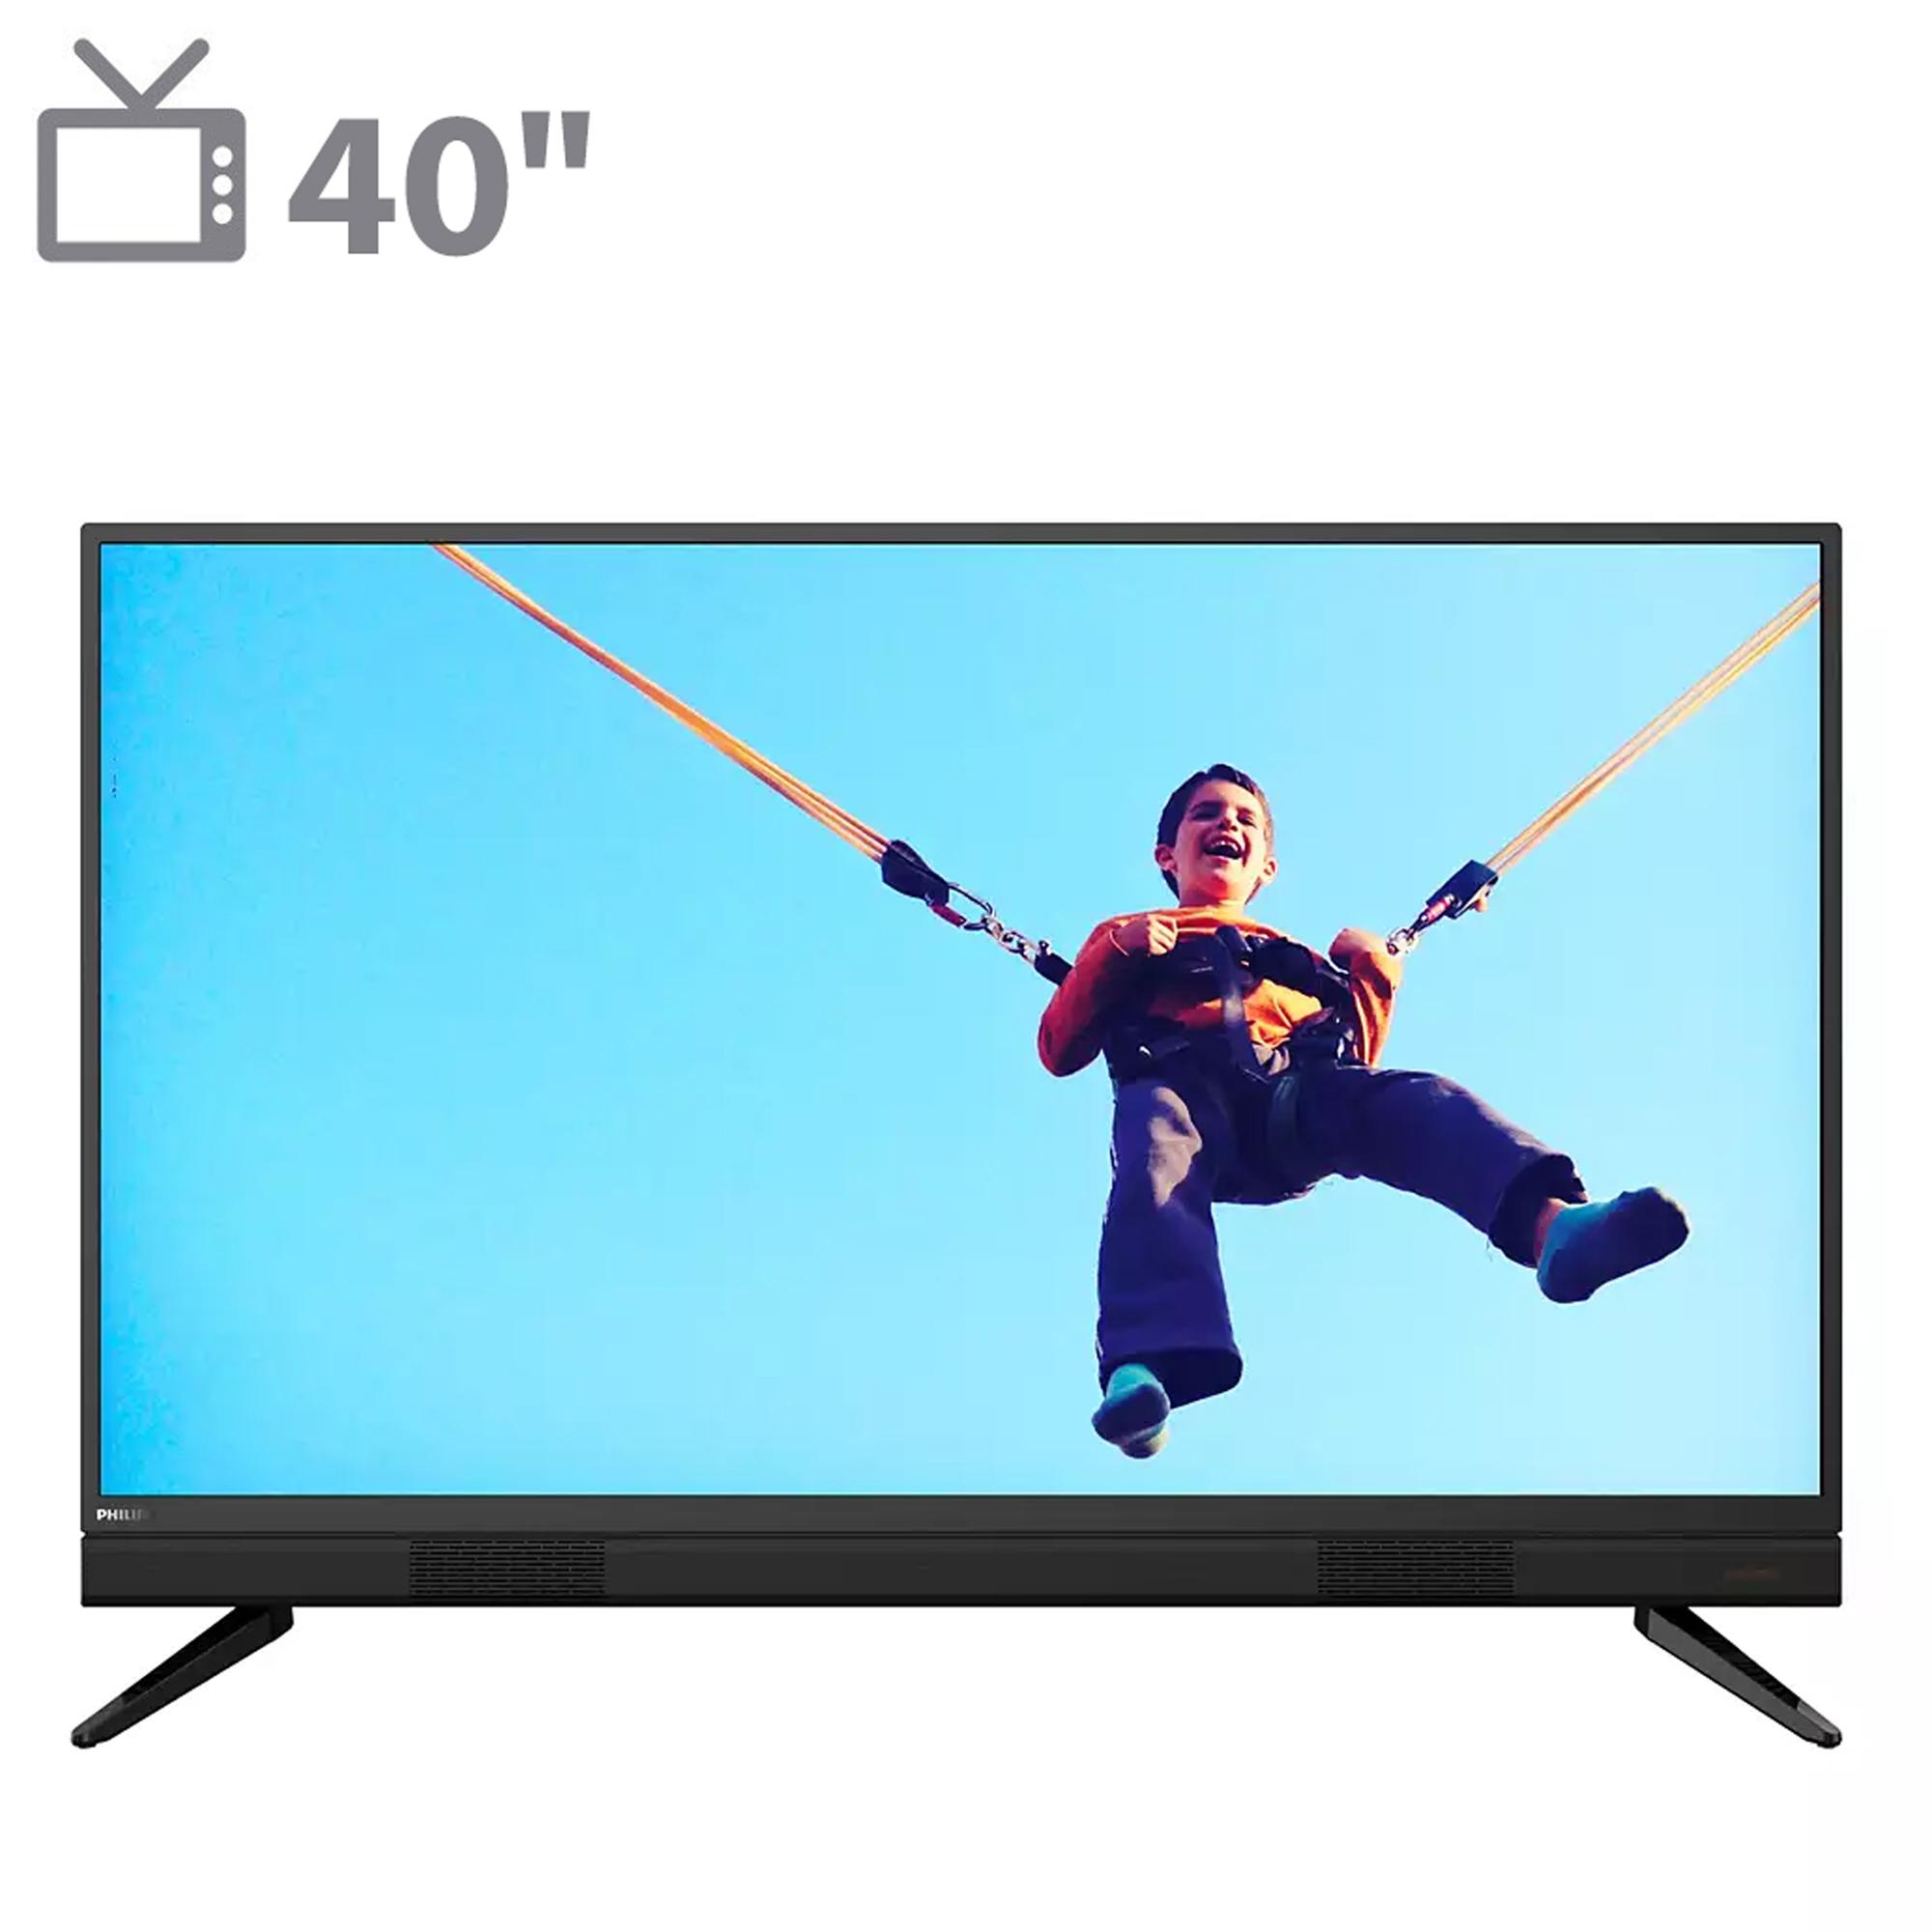 تلویزیون ال ای دی فیلیپس مدل 40PFT5583 سایز 40 اینچ